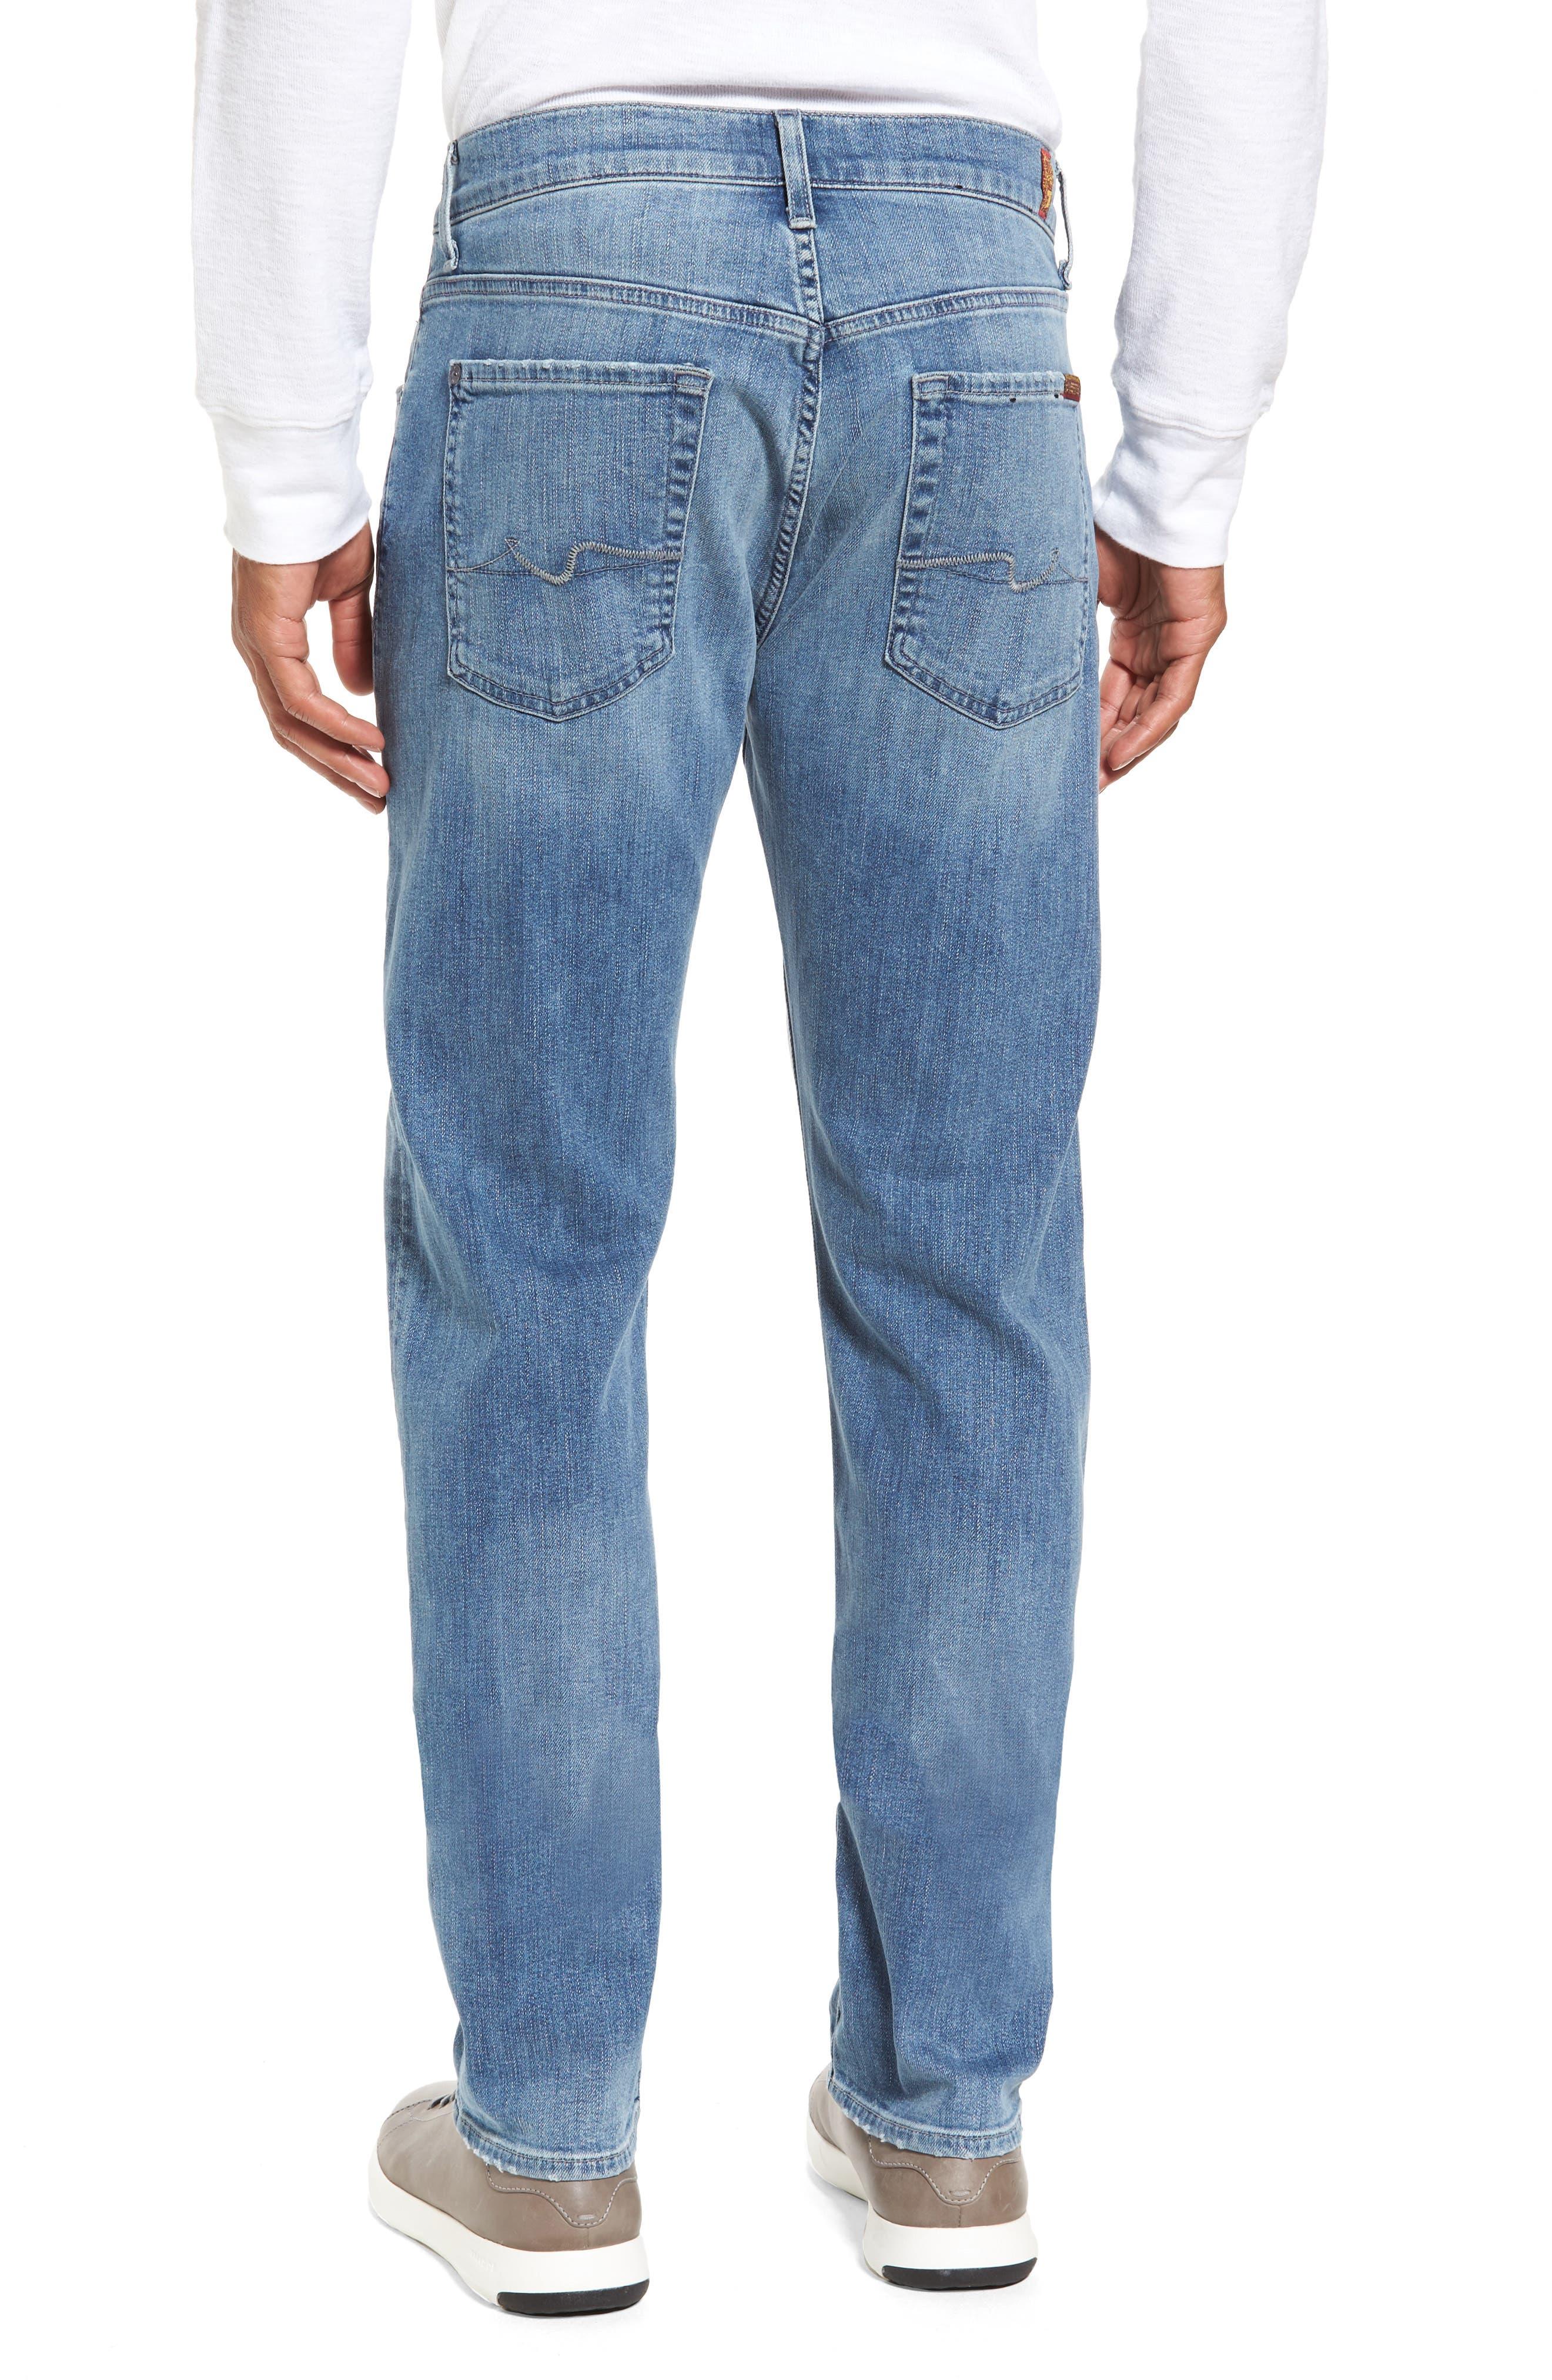 7 For All Mankind Slim Straight Leg Jeans,                             Alternate thumbnail 2, color,                             400